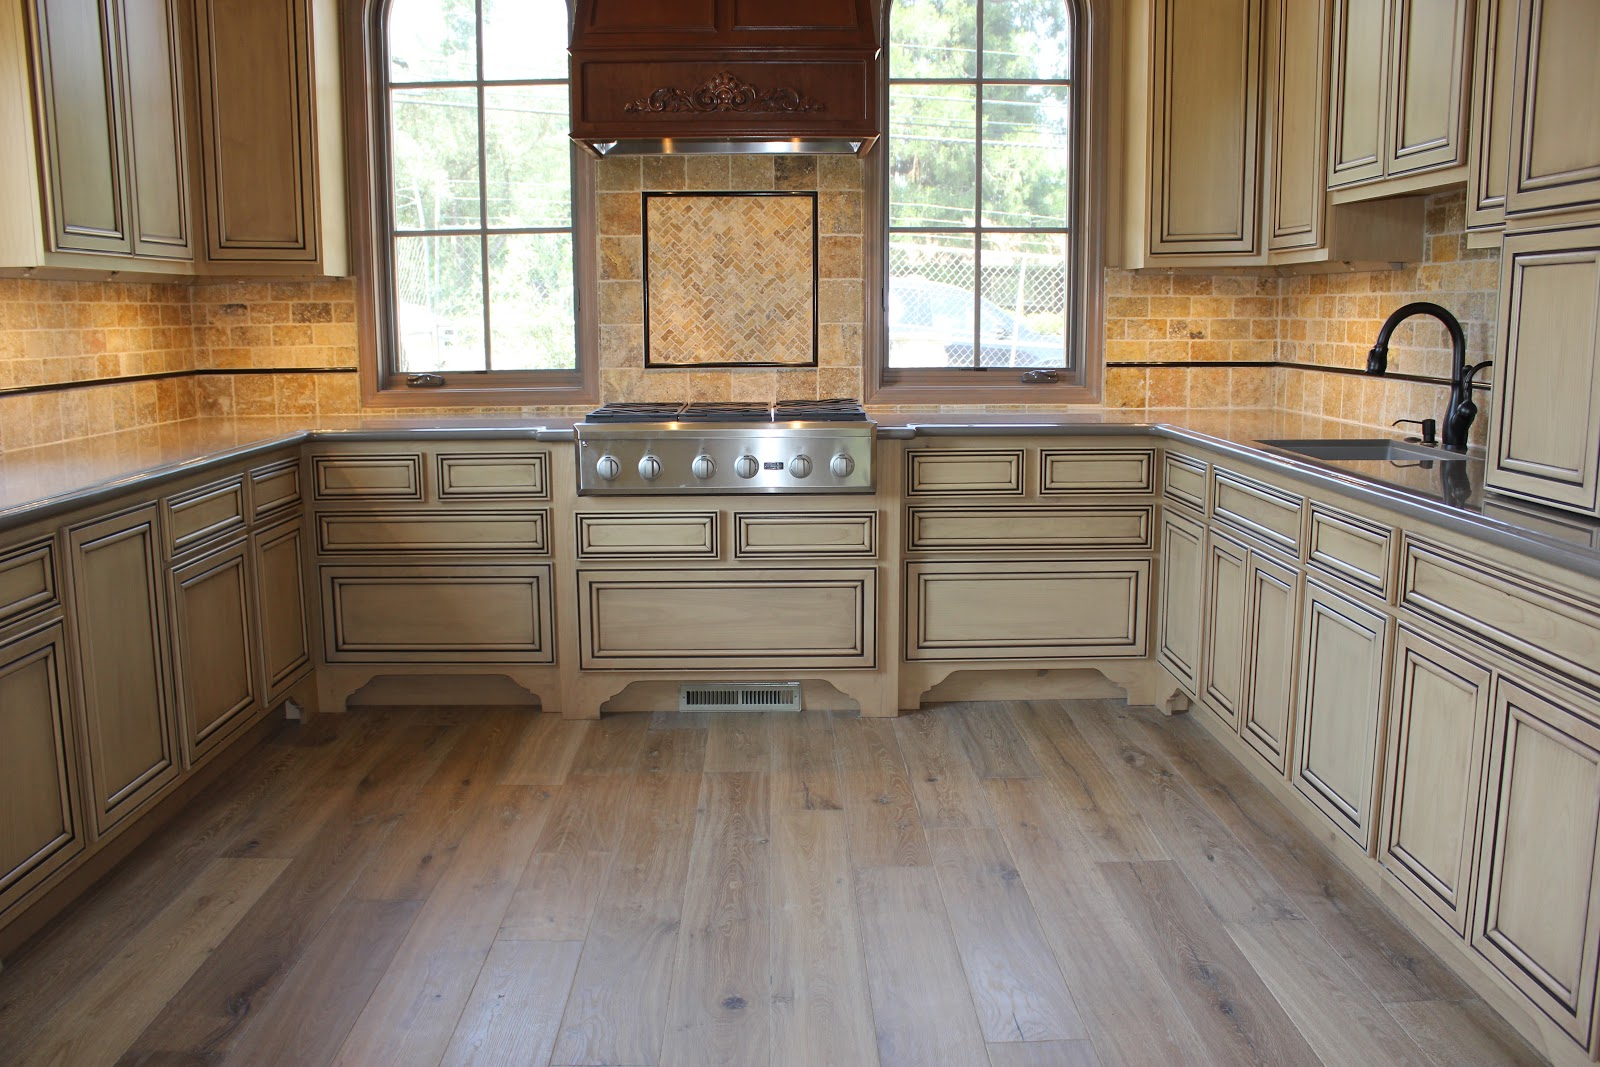 hardwood flooring by royal oak hardwood floor in kitchen